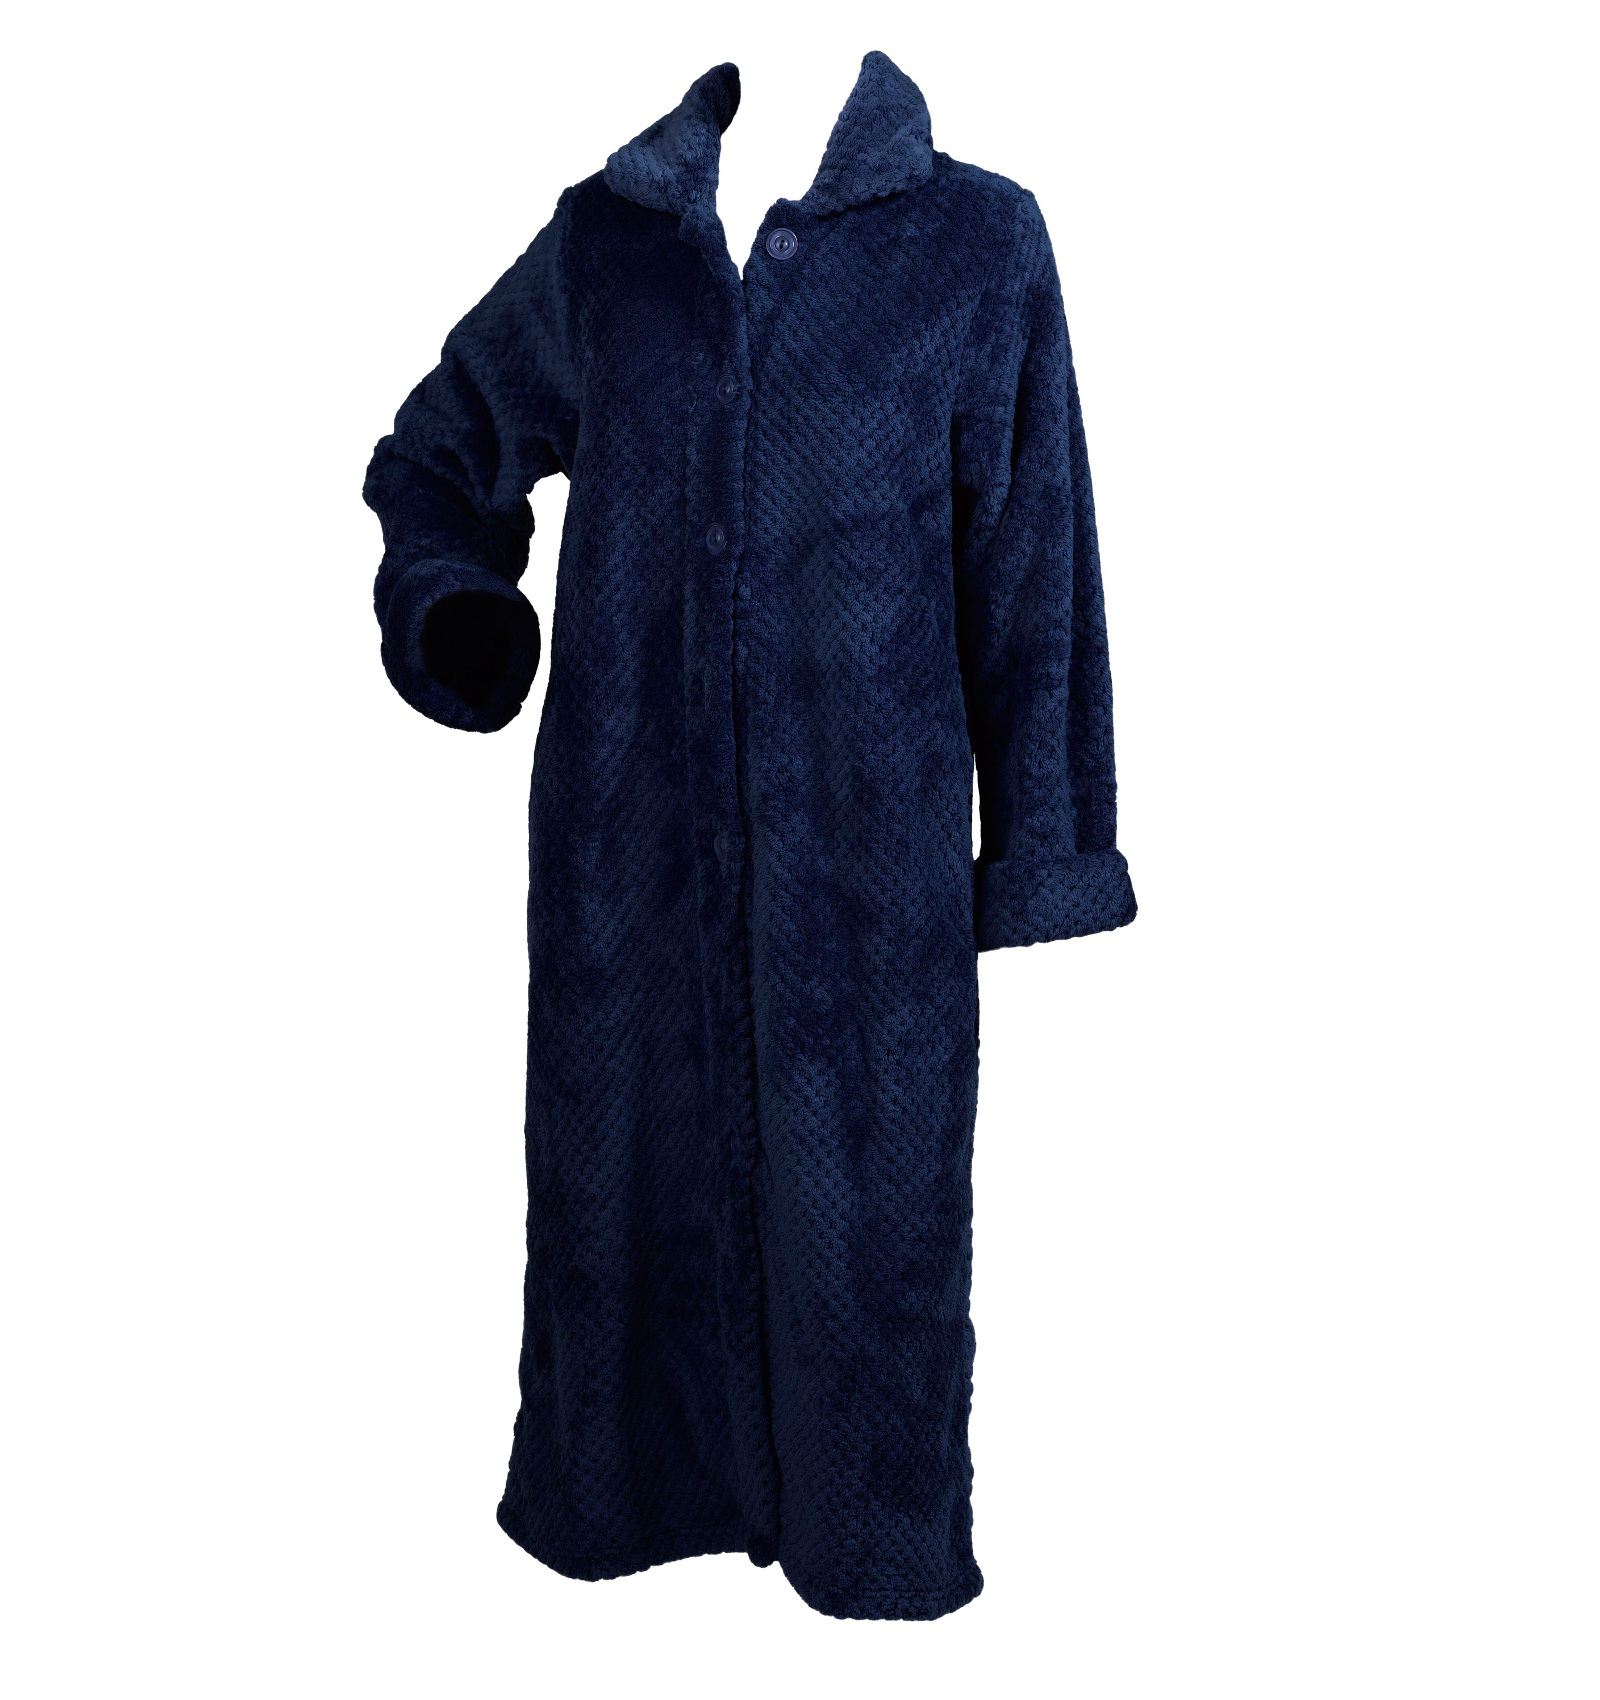 Slenderella Pour Femme Doux Gaufré Peignoir Robe De Chambre Polaire